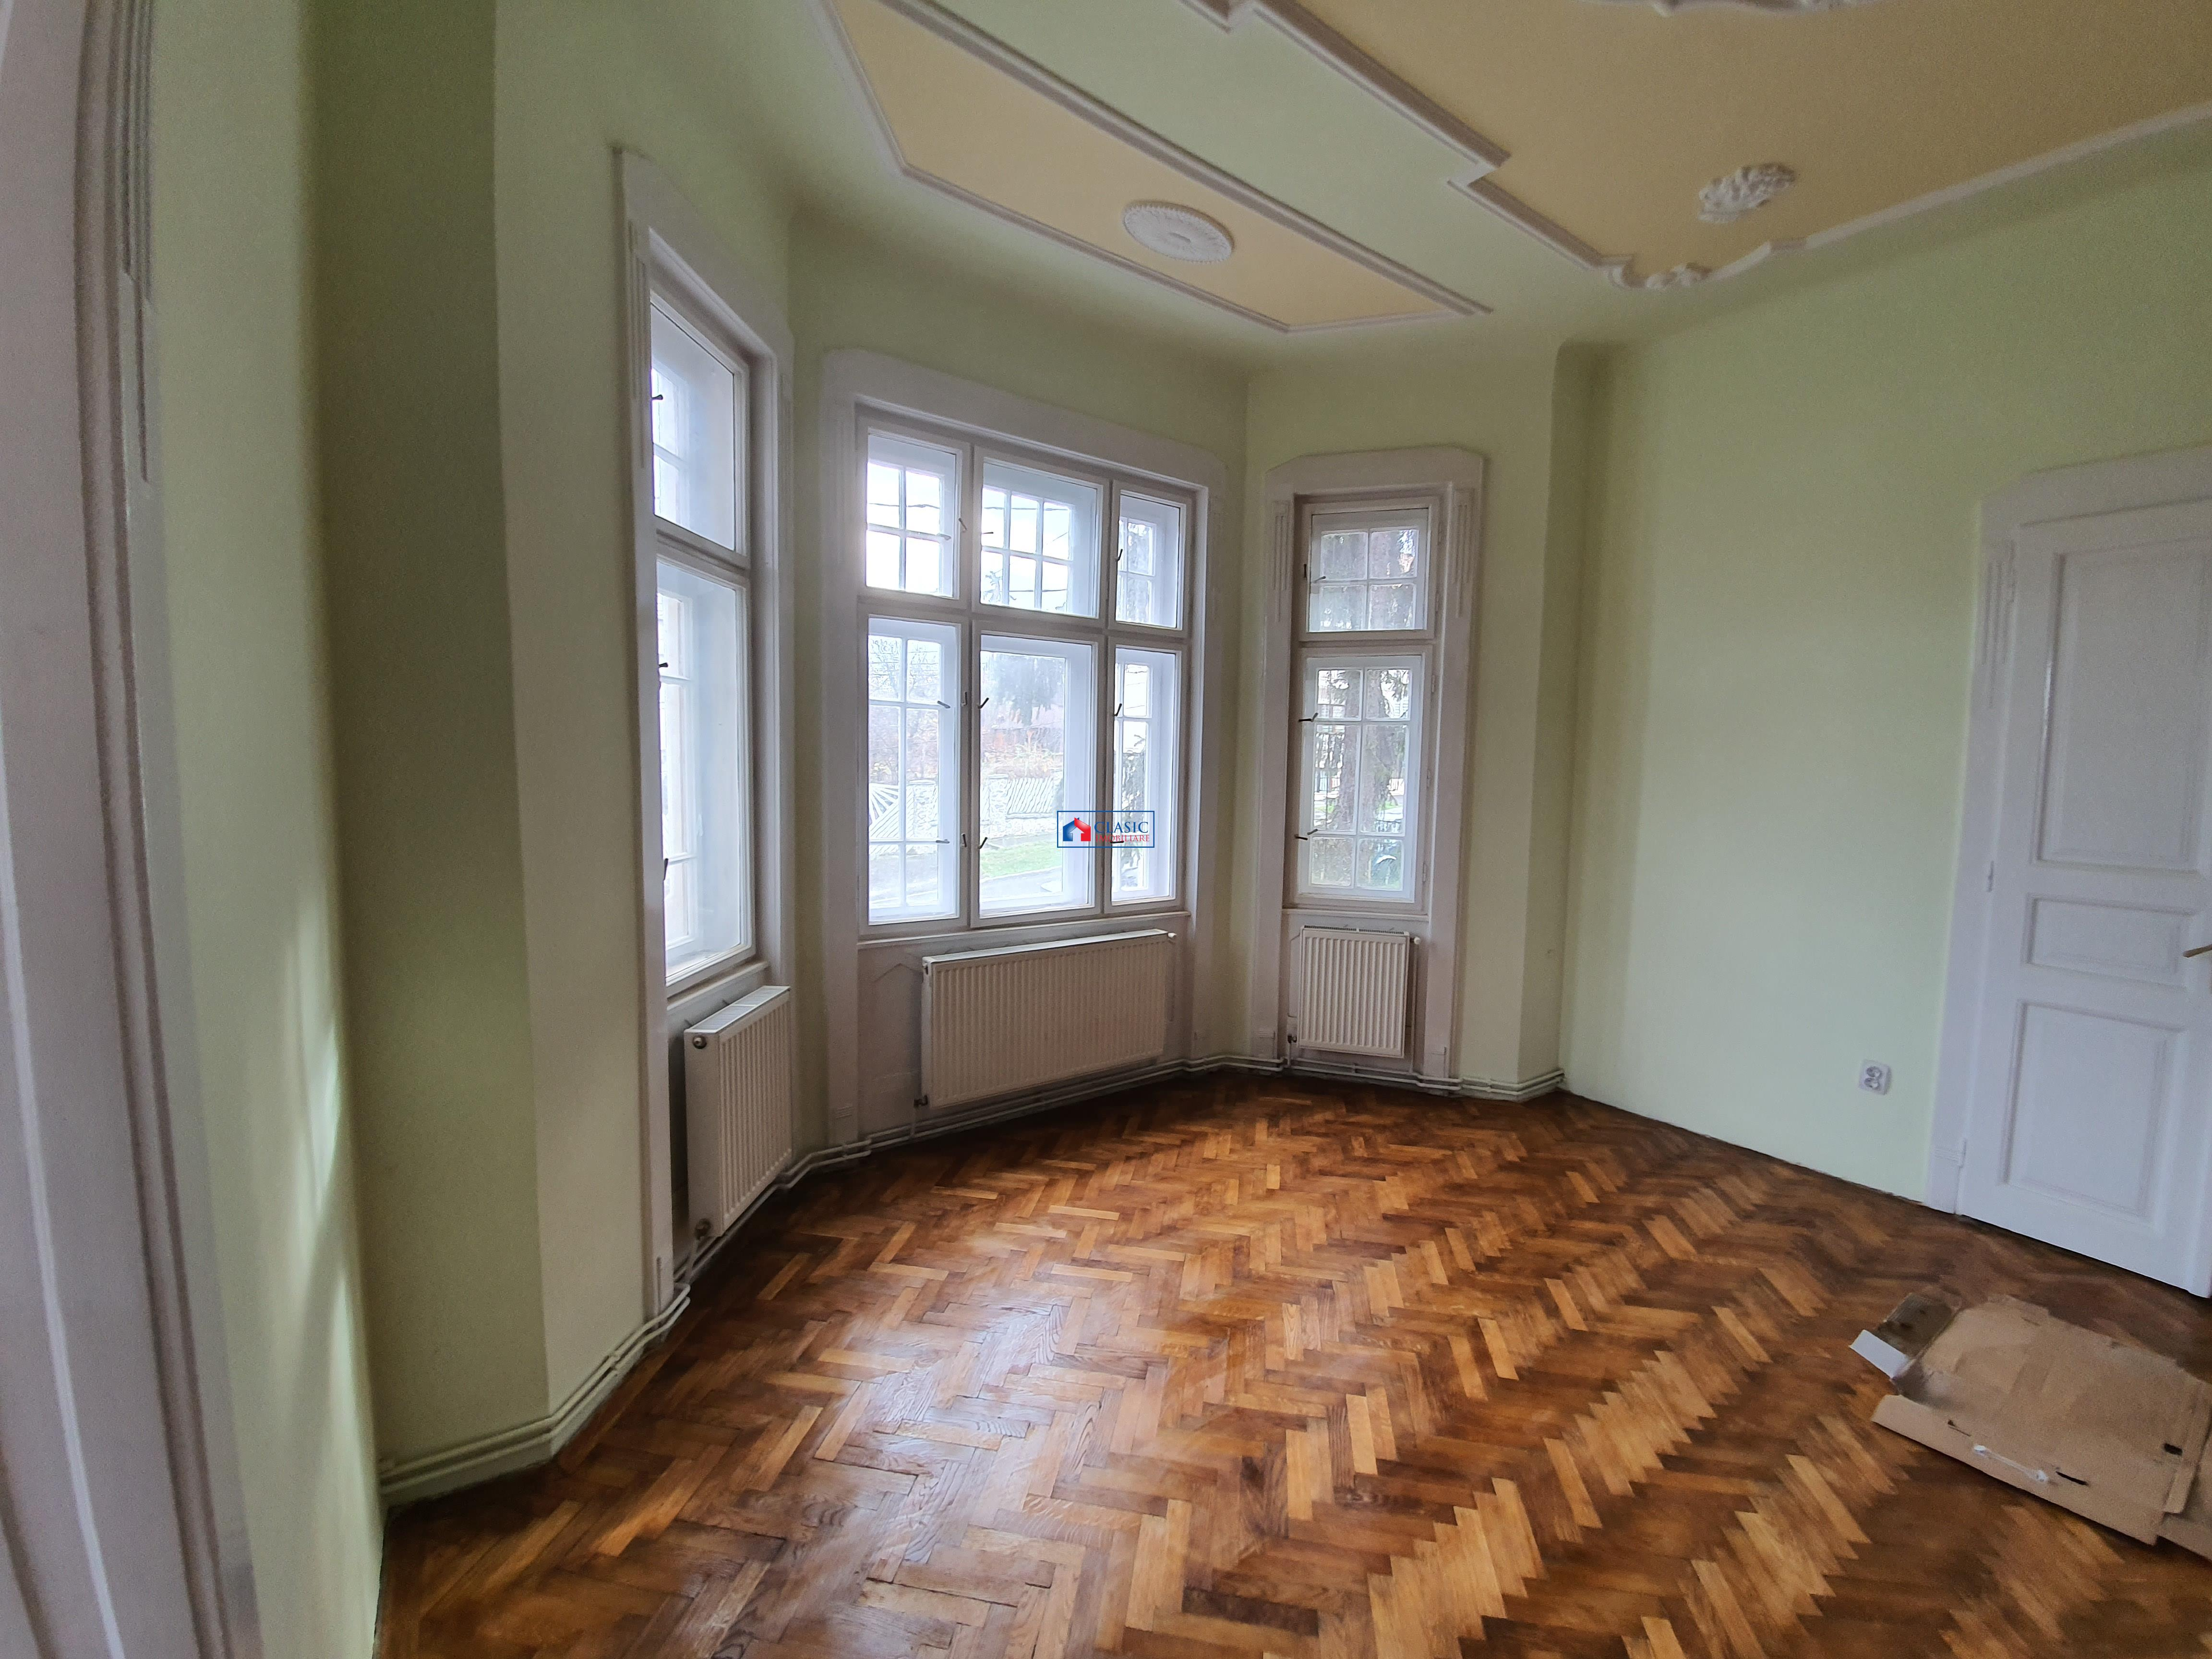 Inchiriere spatiu birouri 150 mp zona A.Muresanu, Cluj Napoca